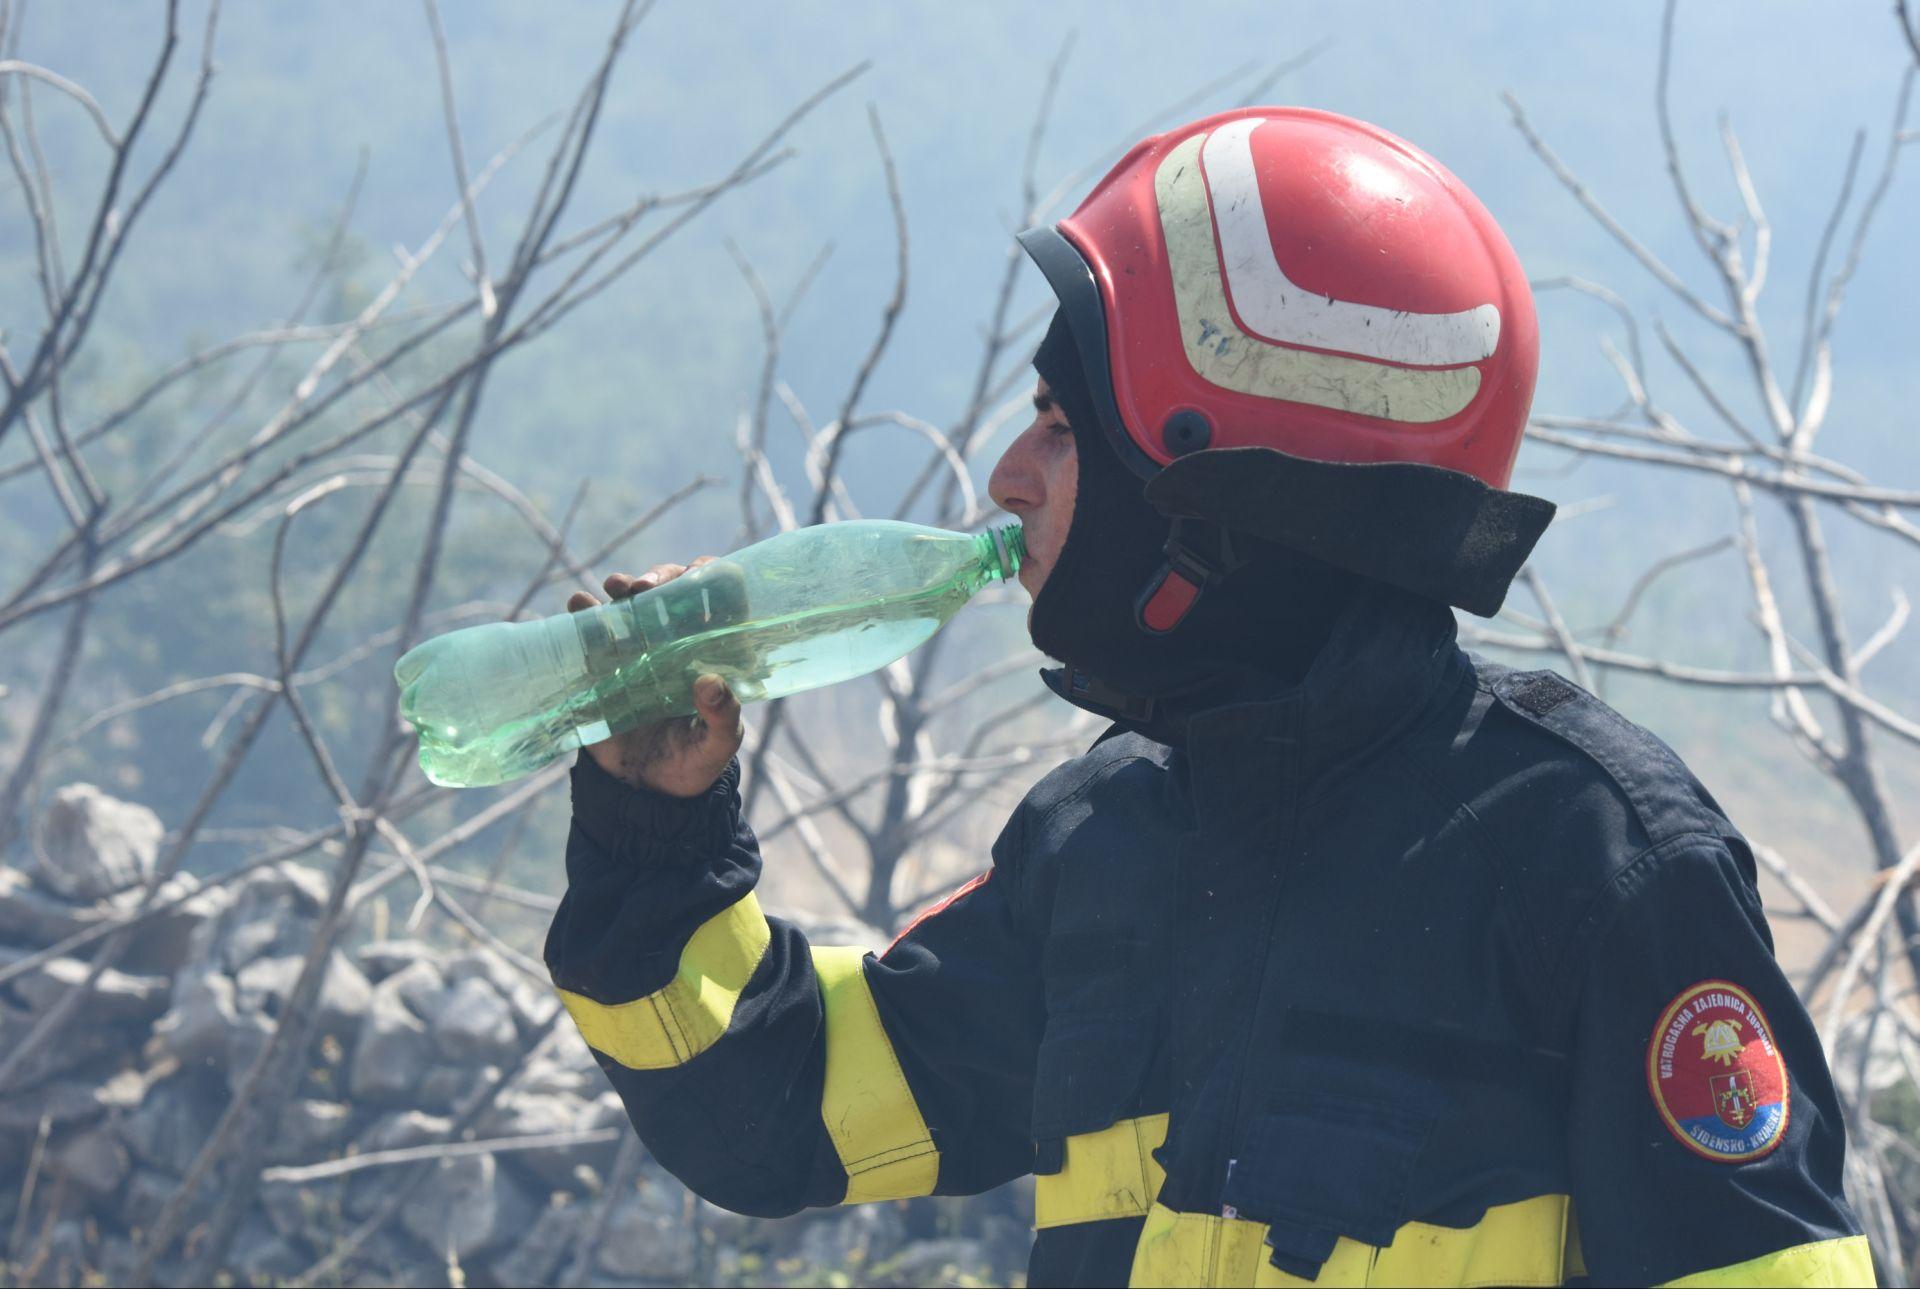 280 VODENIH BOMBI Tri požare gase kanaderi HRZ i PZO-a